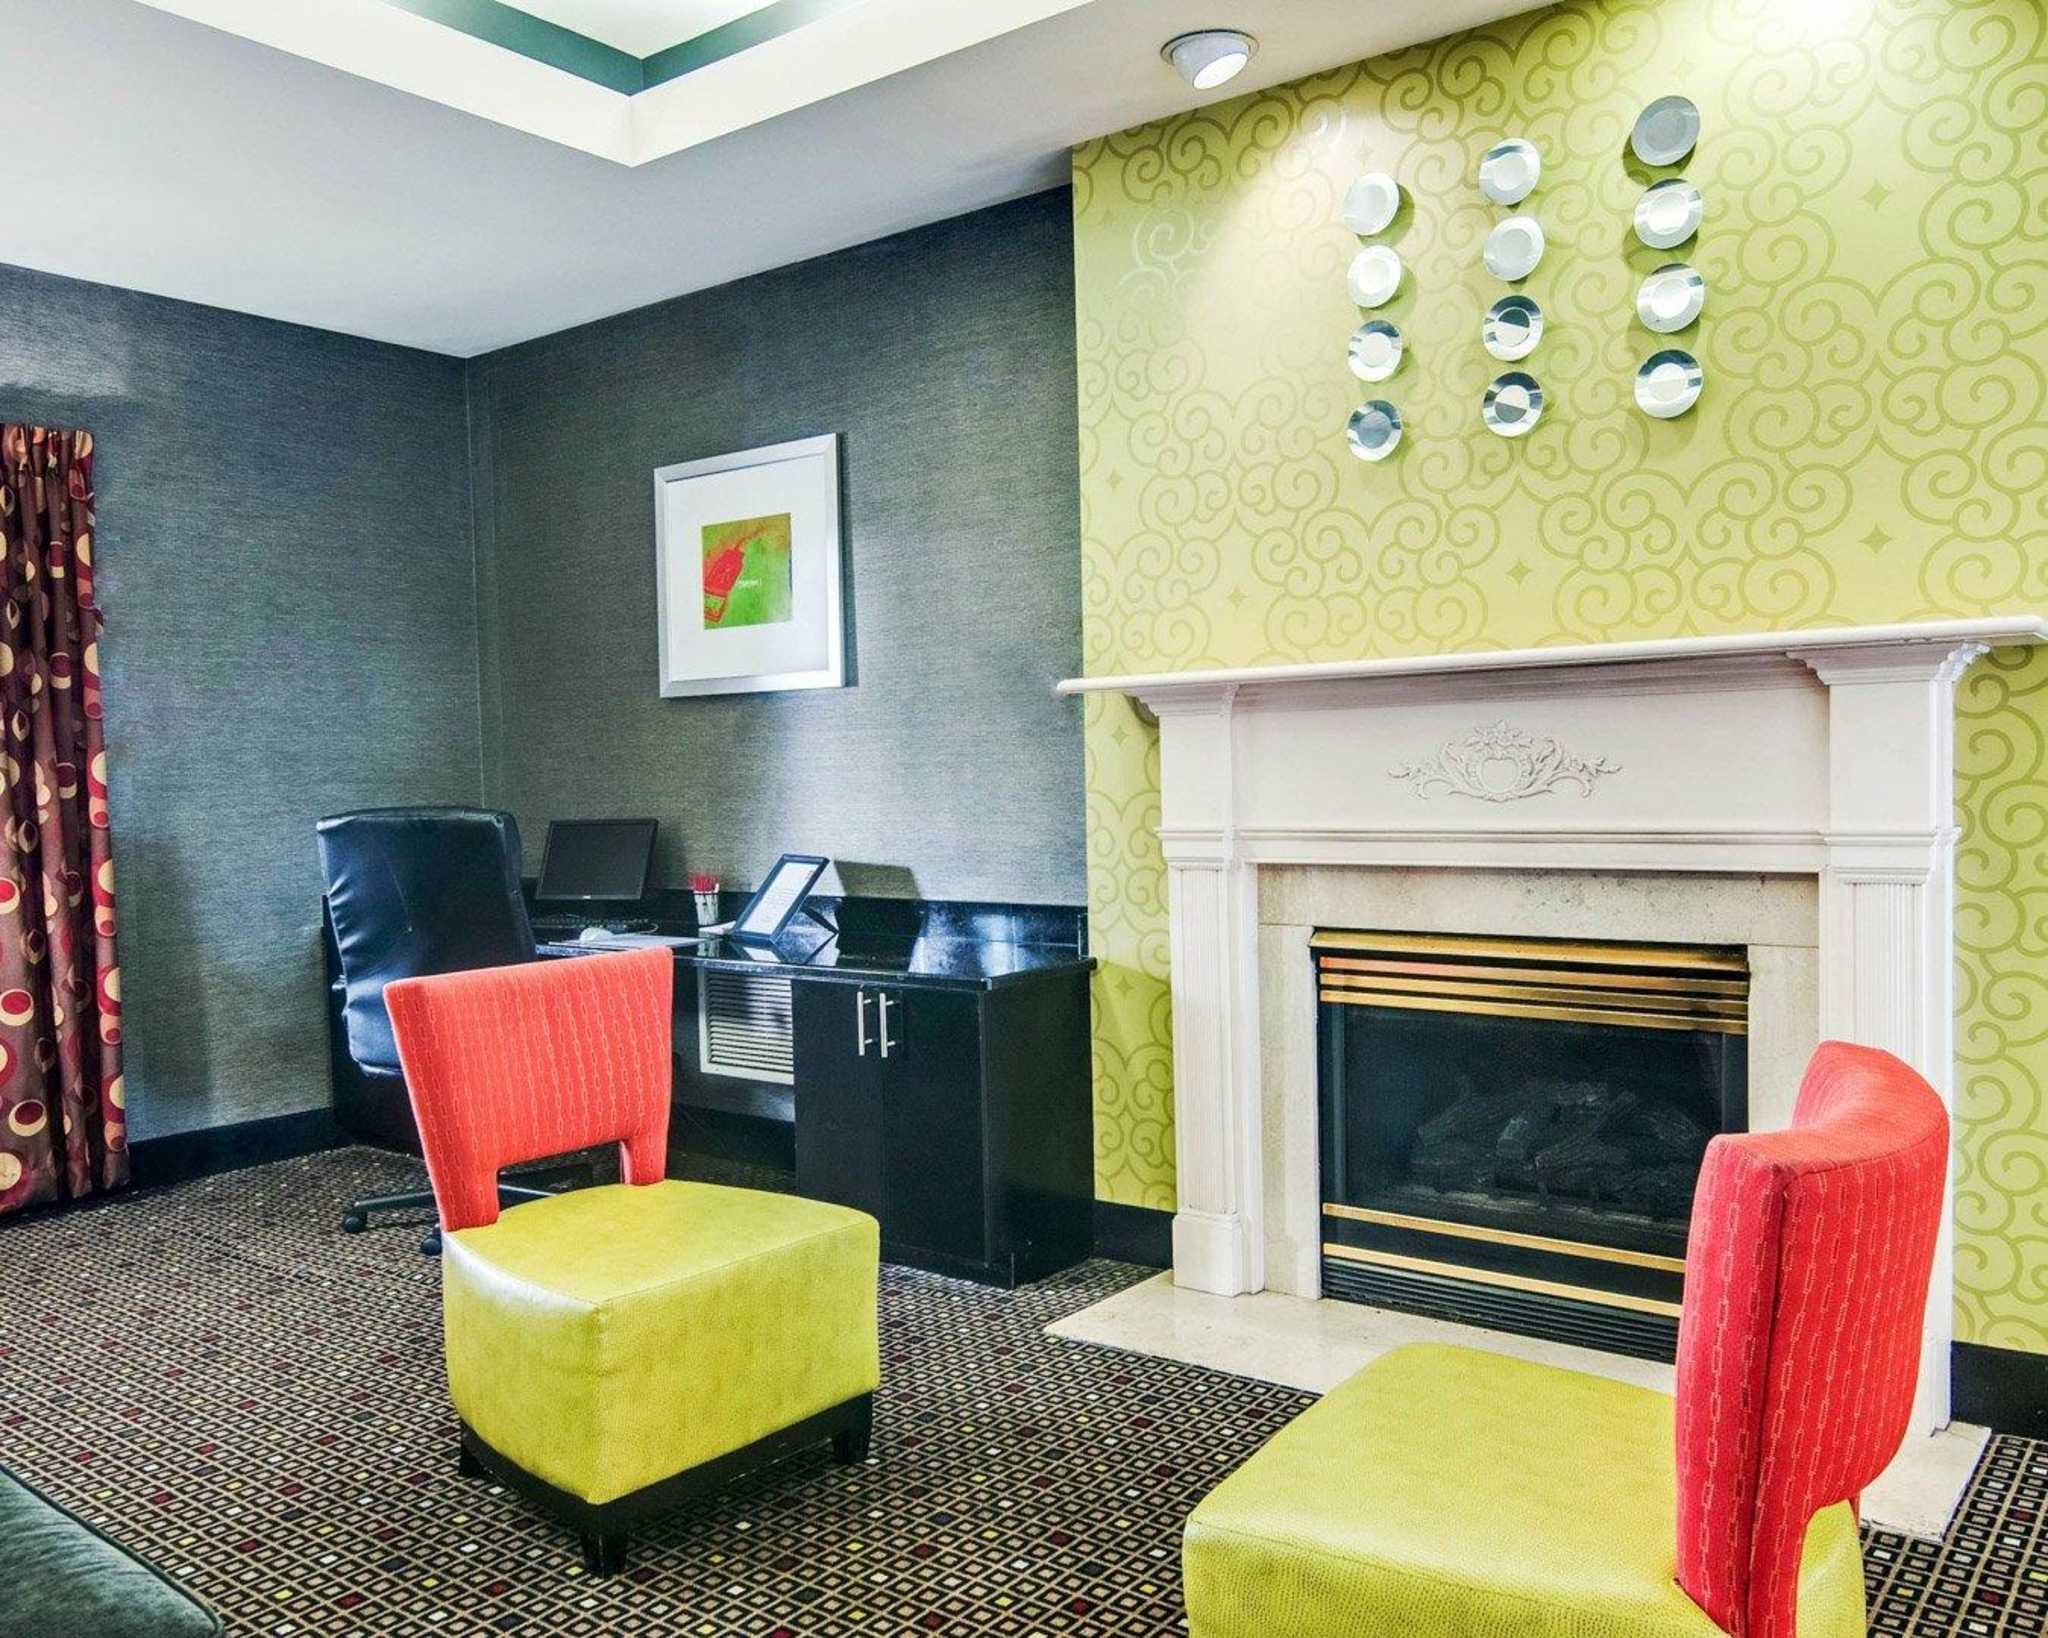 Comfort Suites Inn at Ridgewood Farm image 13